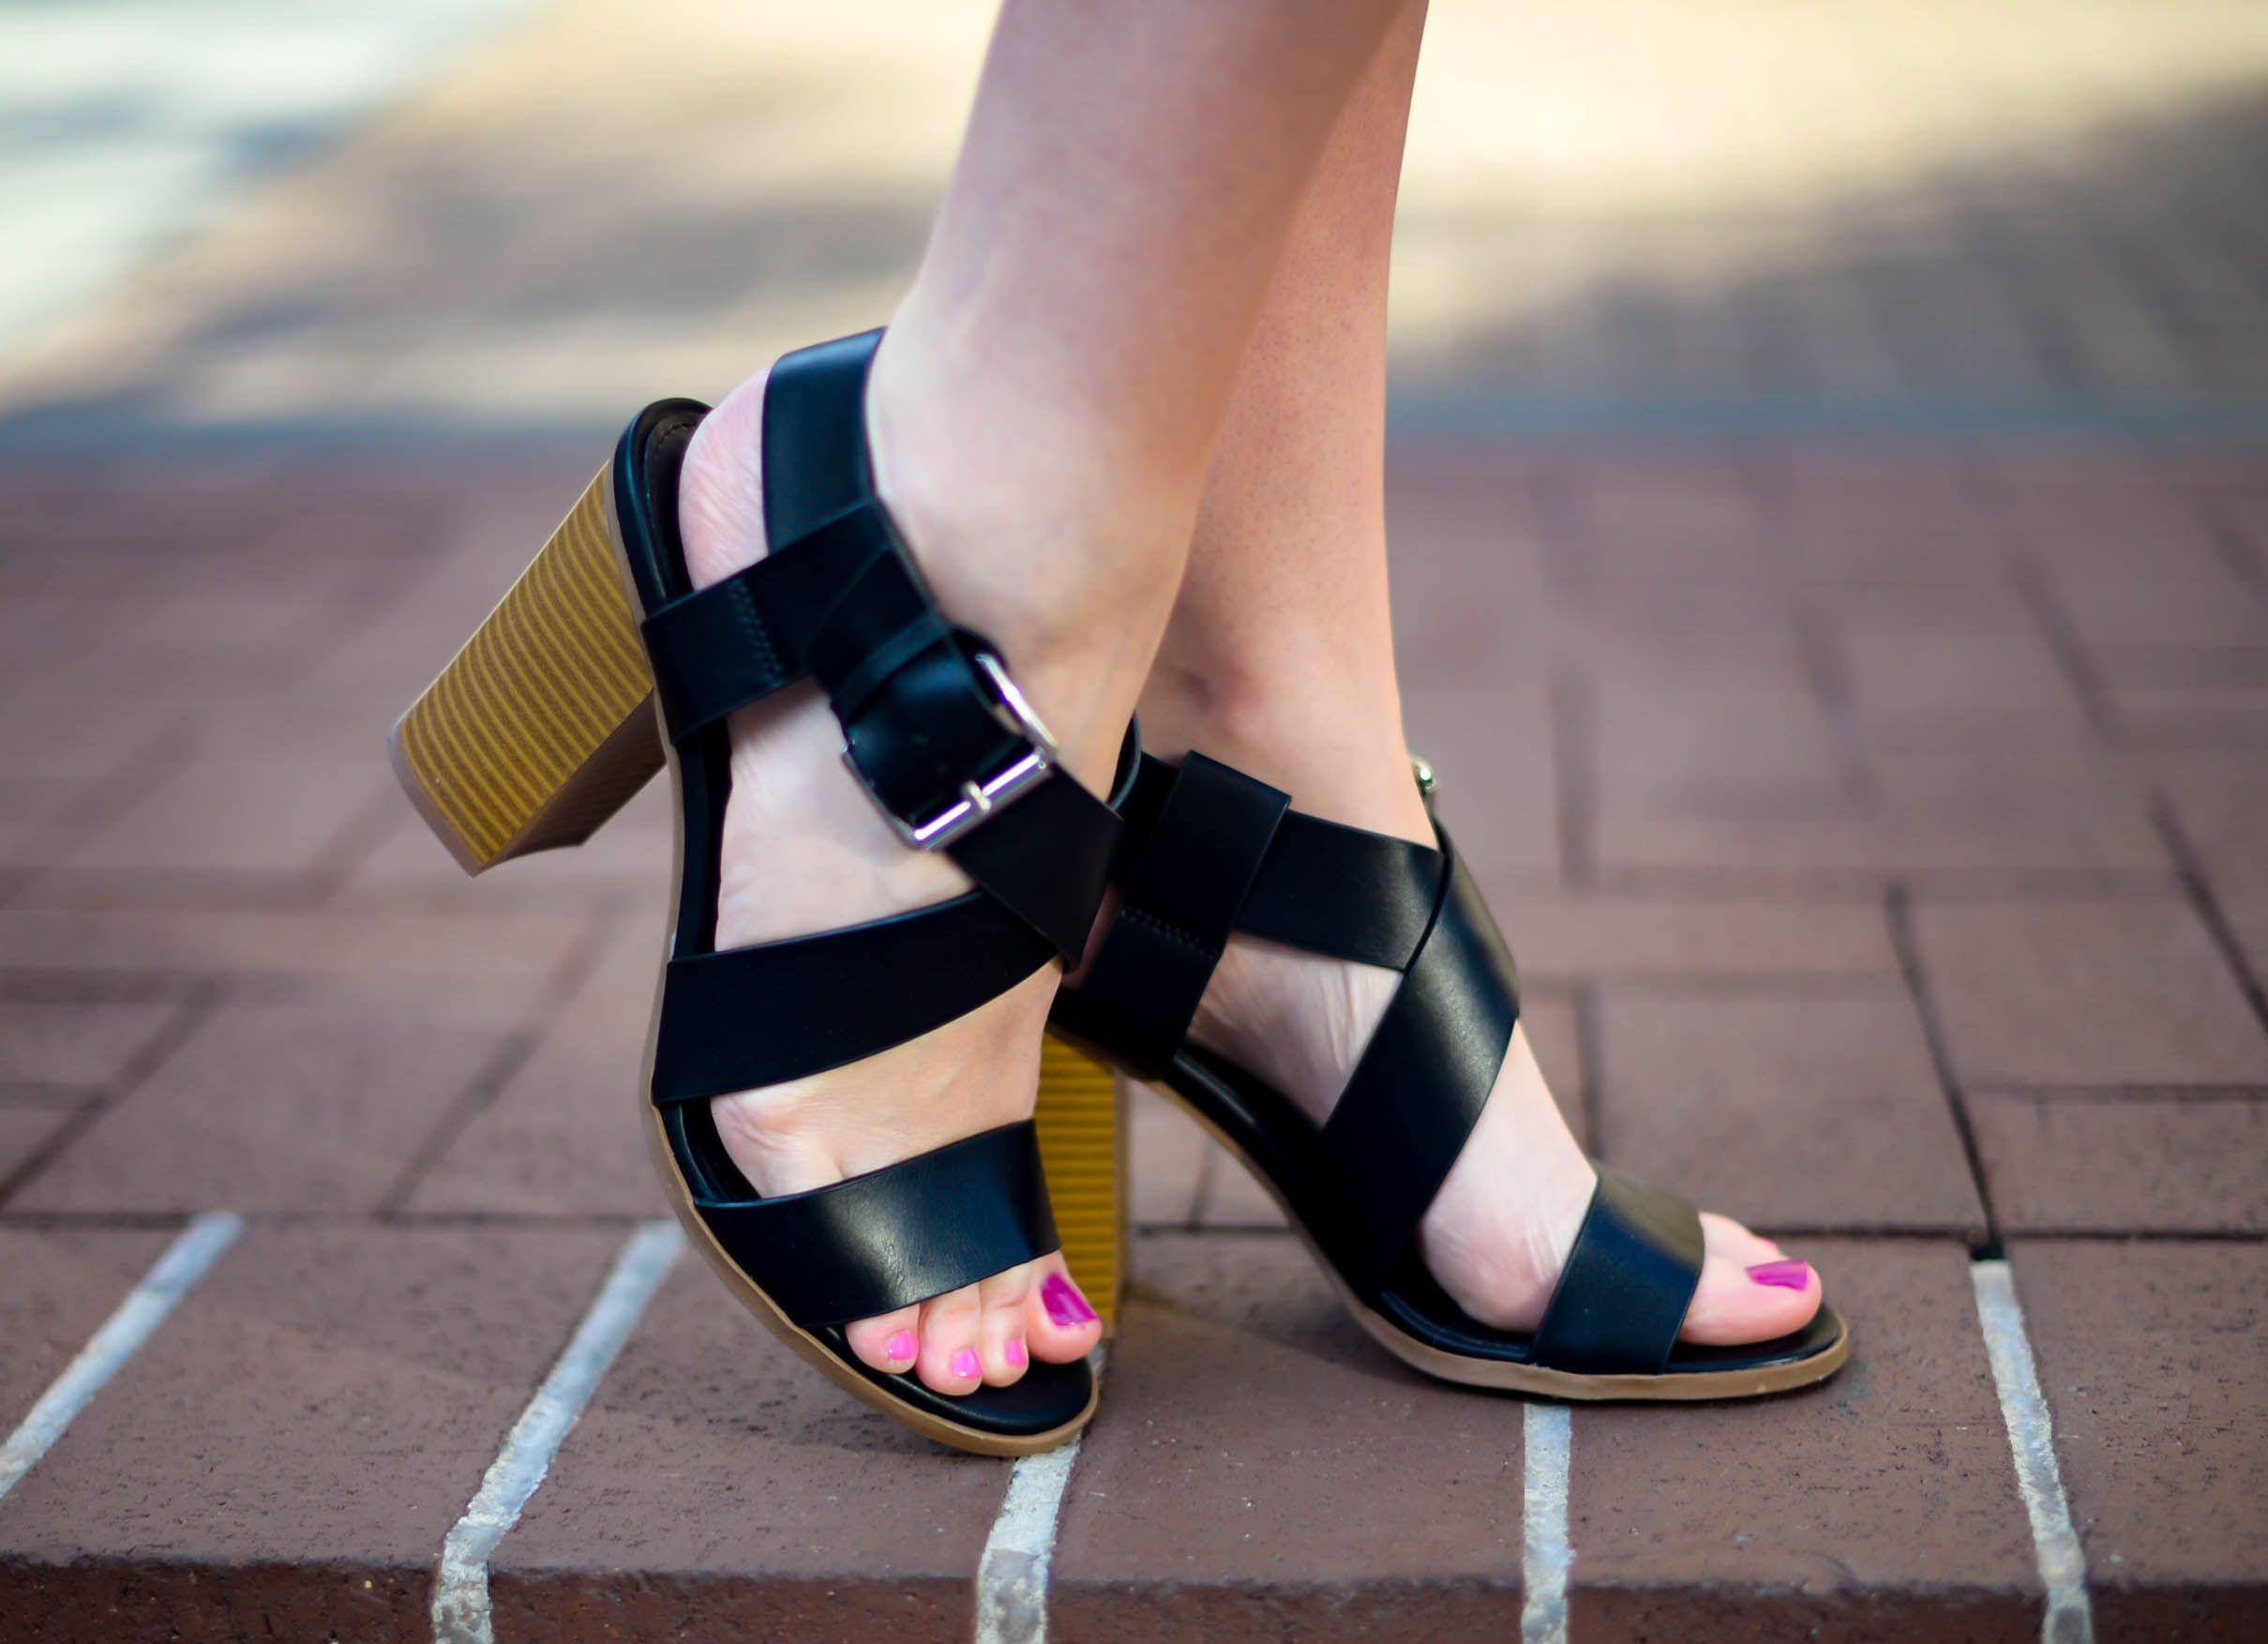 6664b9b8cfcd6 Rock the chunky heel trend in the Romeo sandal from @csiriano ...